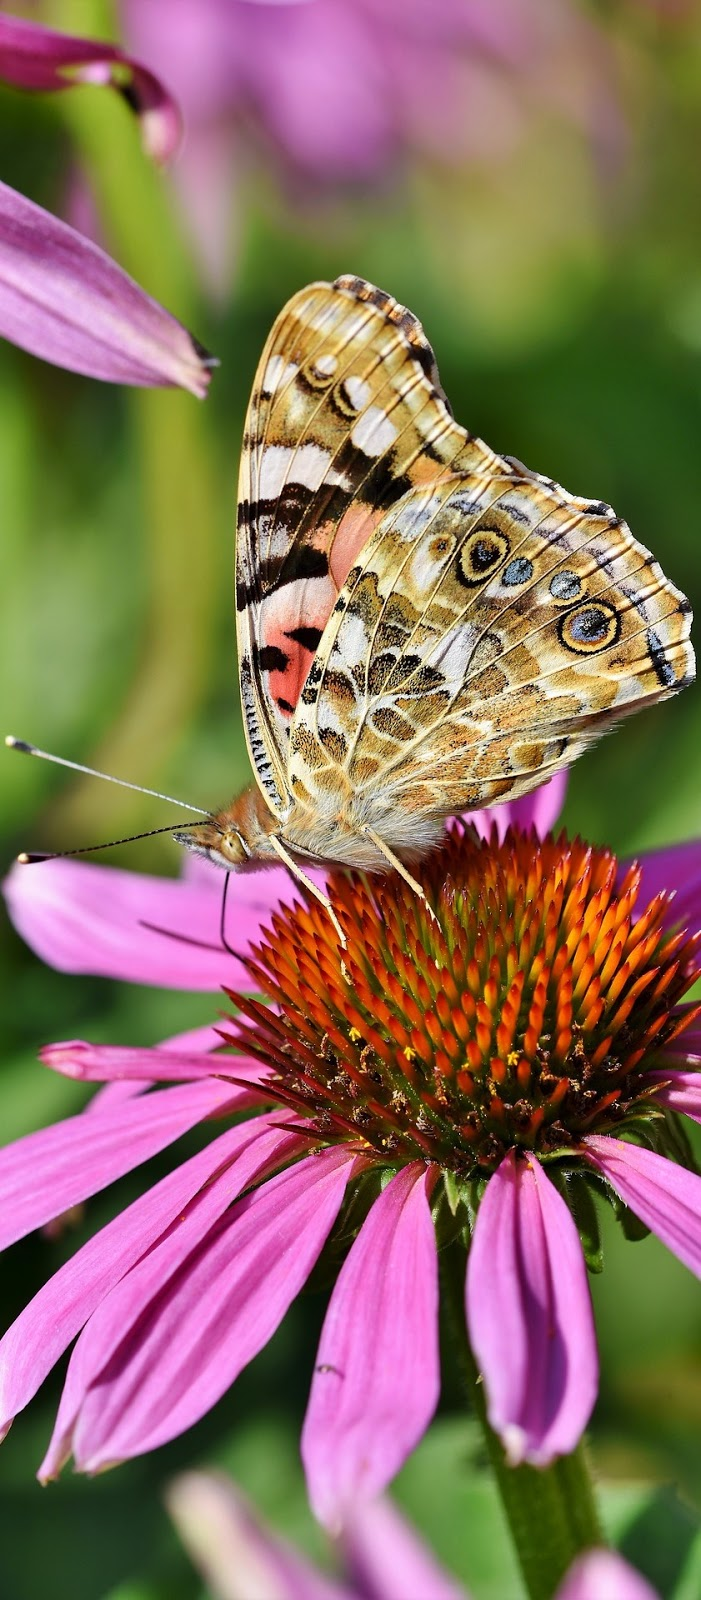 A pretty butterfly.